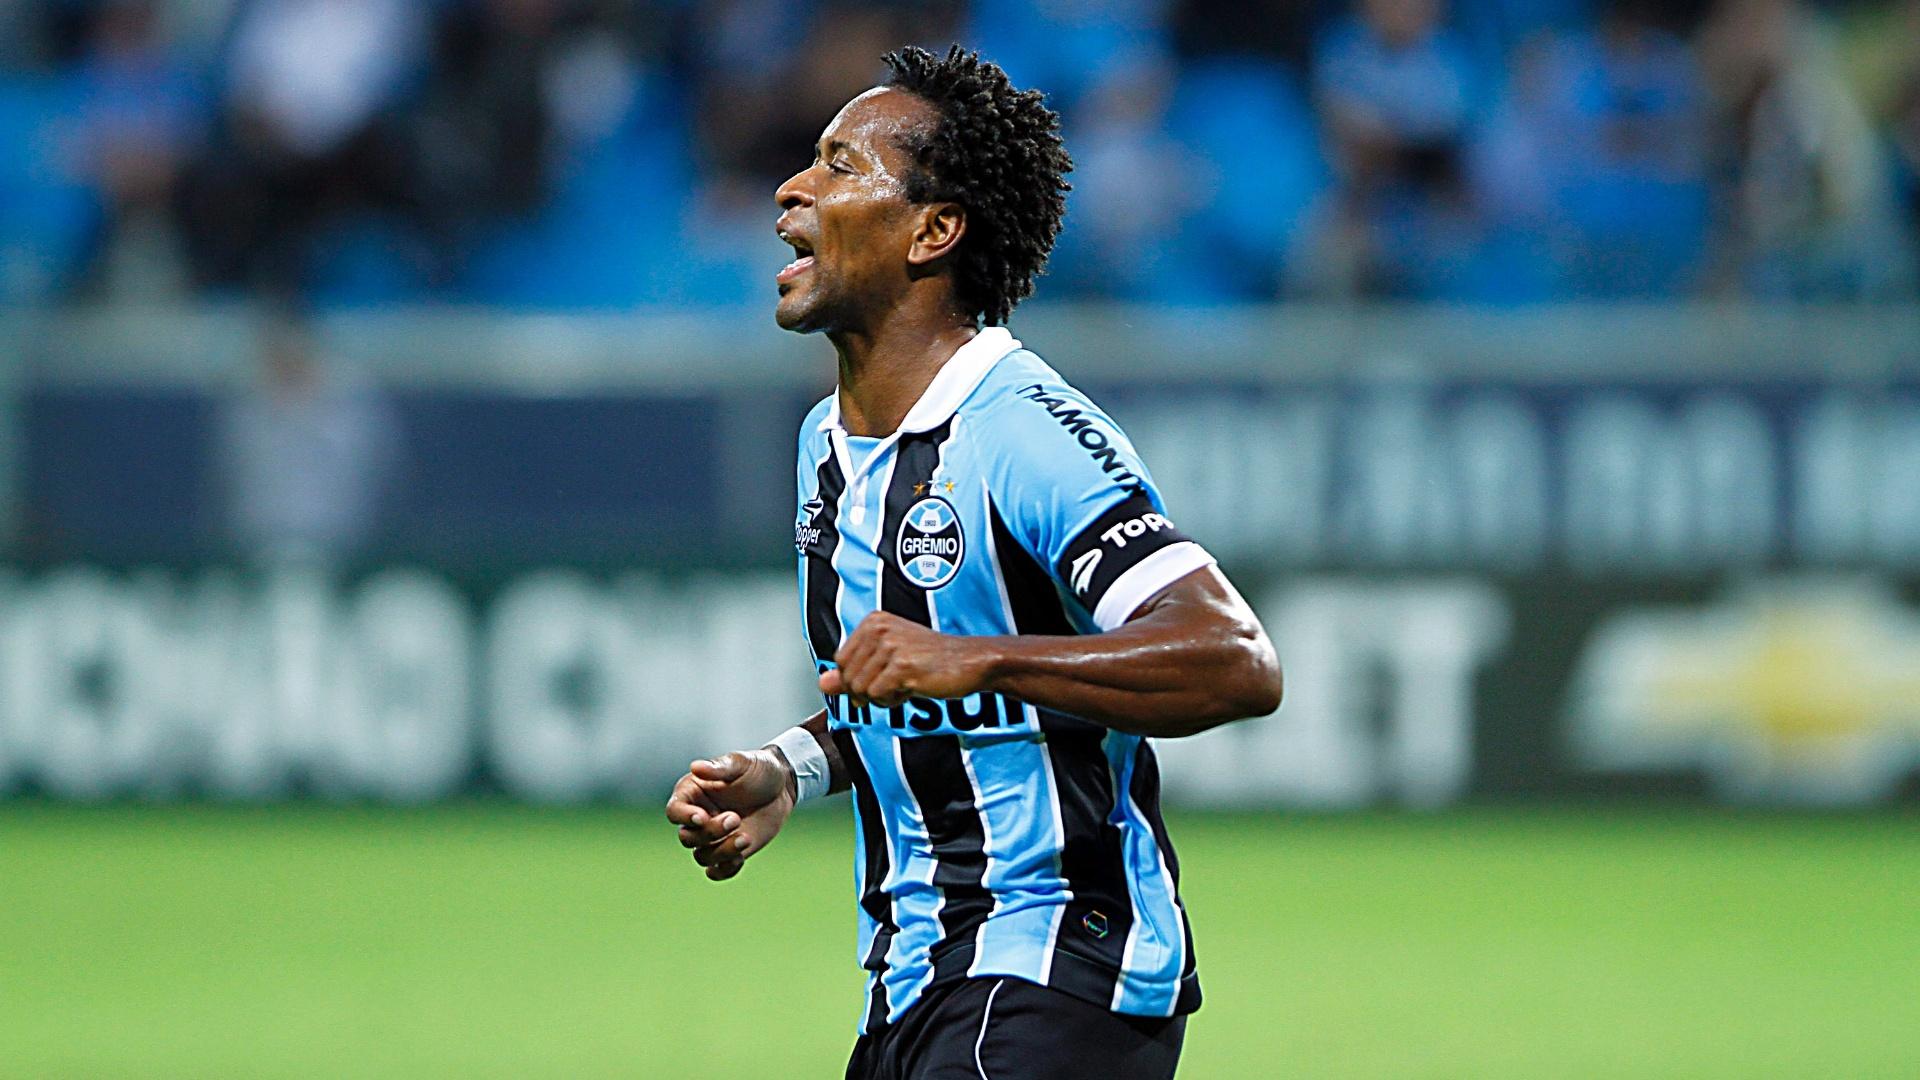 Zé Roberto marcou gol do Grêmio contra Lajeadense pela Taça Farroupilha na Arena do Grêmio